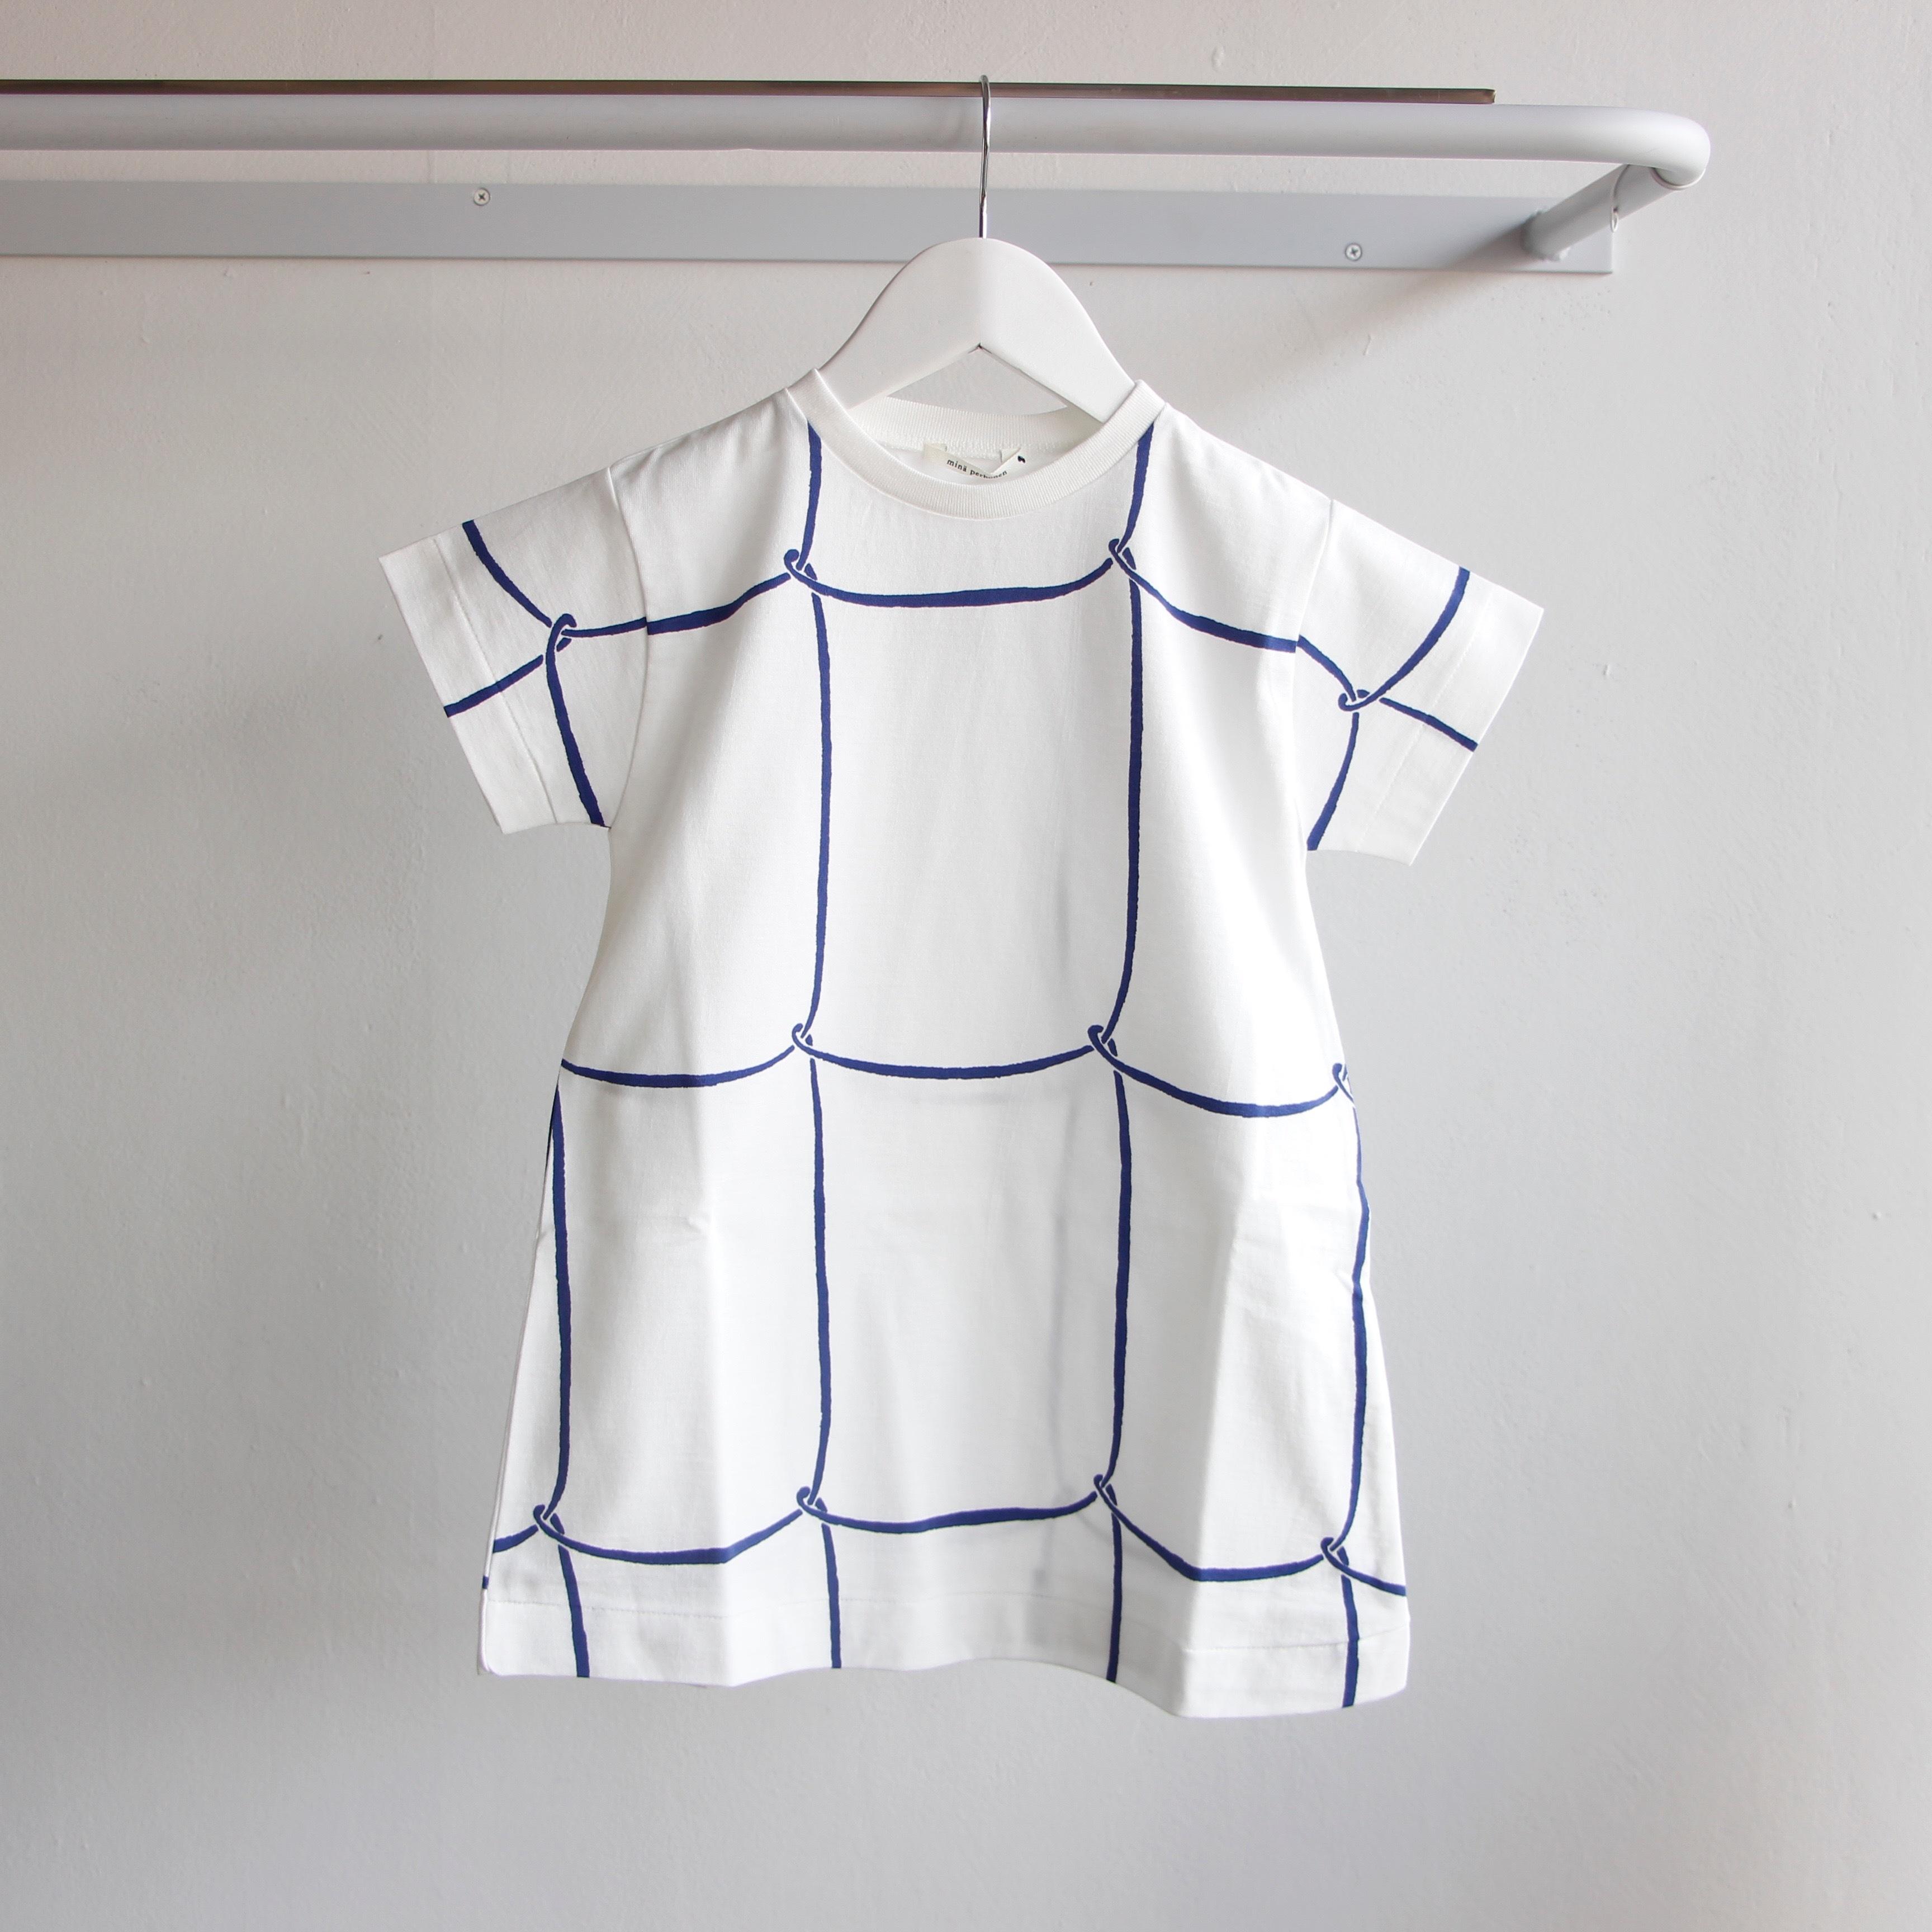 《mina perhonen 2018SS》ribbon frame ワンピース / white / 110-130cm